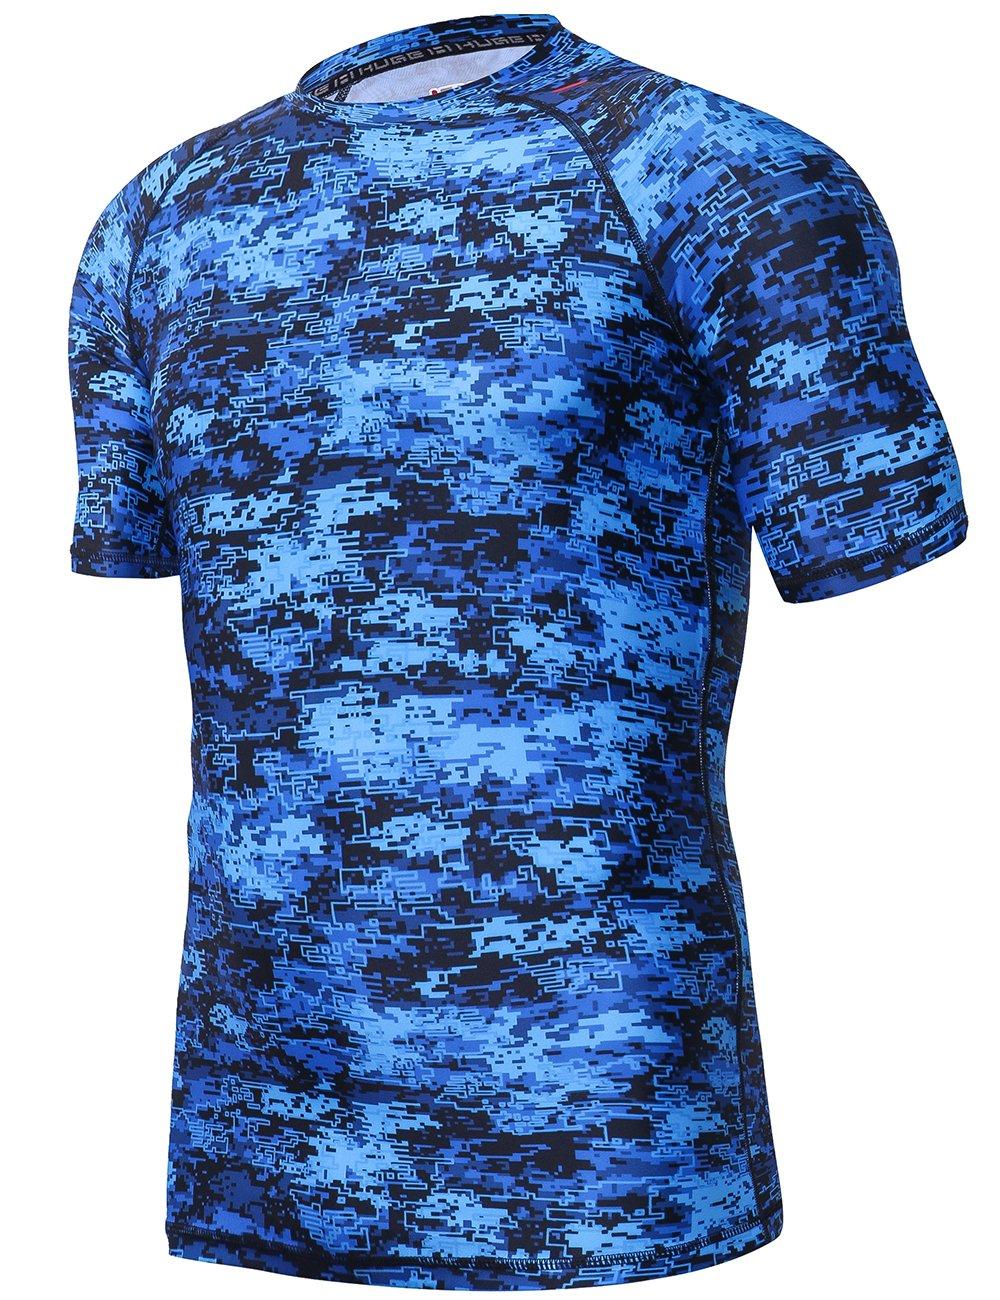 HUGE SPORTS Men's UV Sun Protection UPF 50+ Full Digital Print Rash Guard Short LBX CA-MRG006Cp-Sh